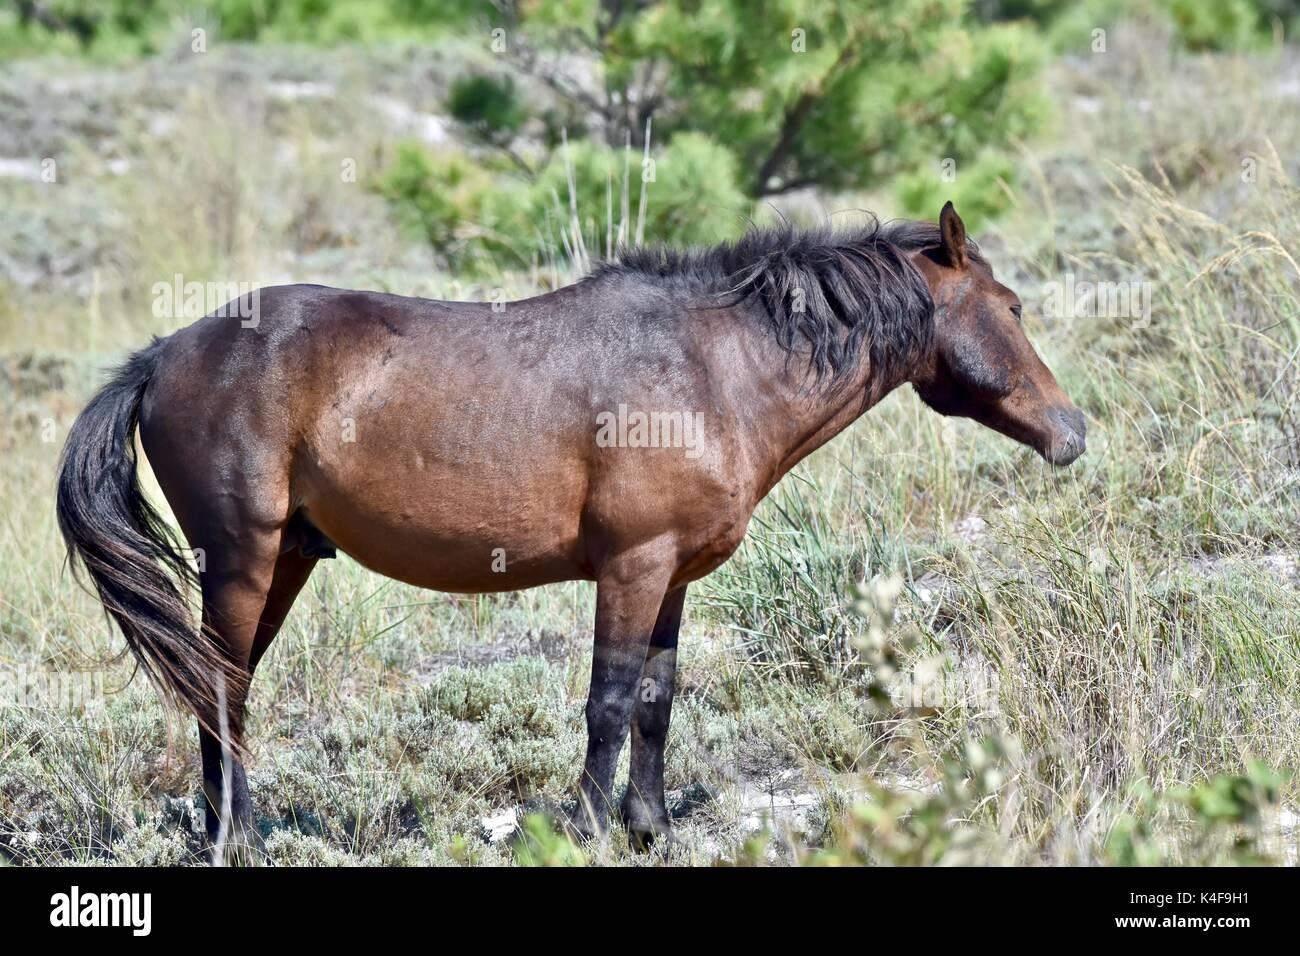 Wild horse (Equus ferus) at the Assateague island National seashore - Stock Image